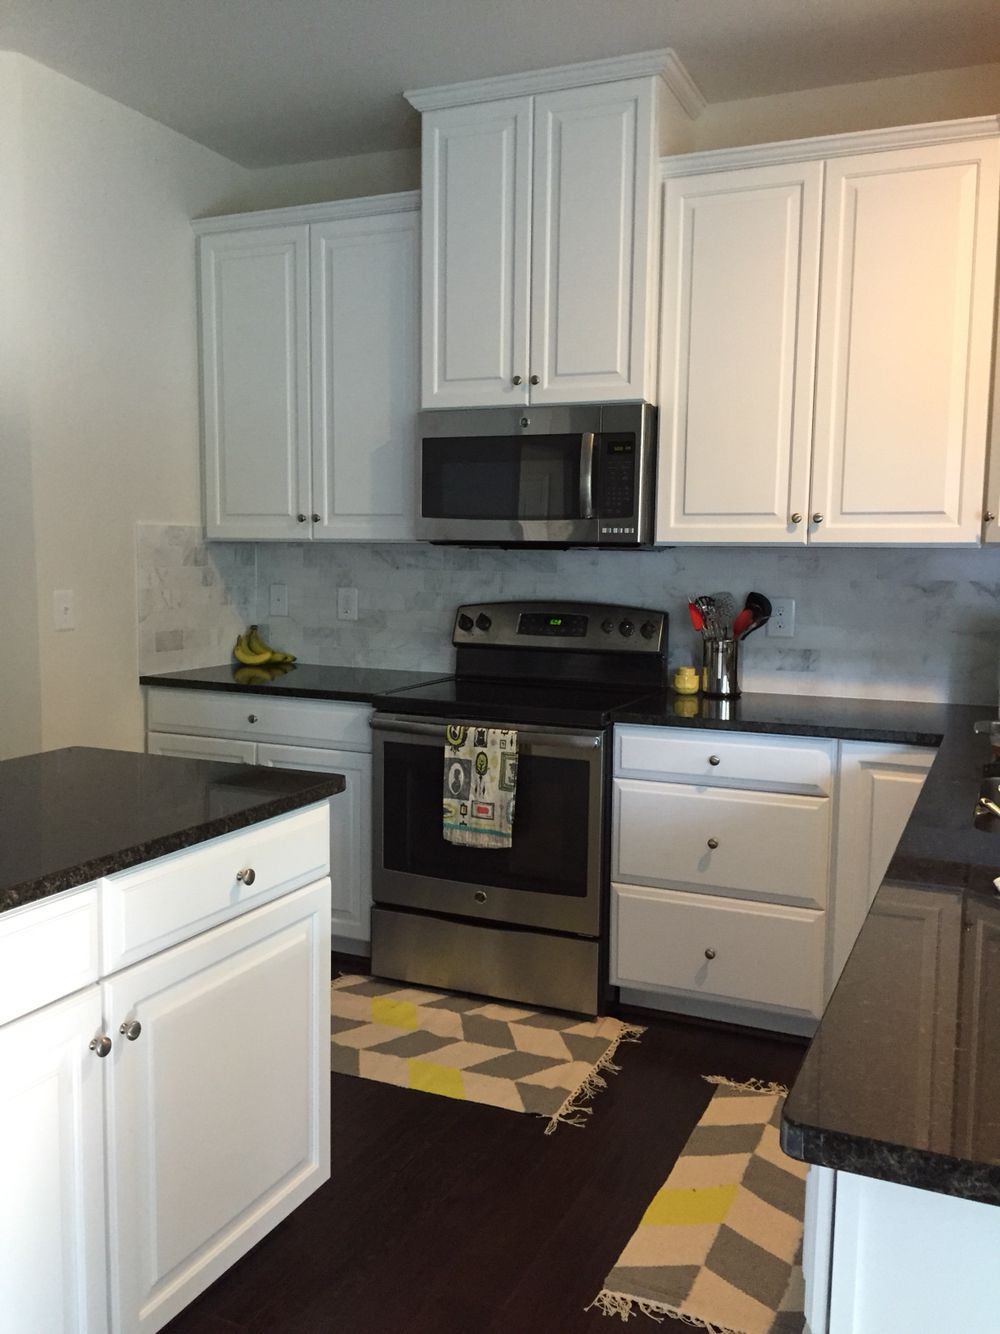 Black And White Kitchen With Honed Marble Backsplash And Uba Tuba Granite Countertops Duhhrie Kitchen Design Kitchen Cabinet Design Marble Countertops Kitchen